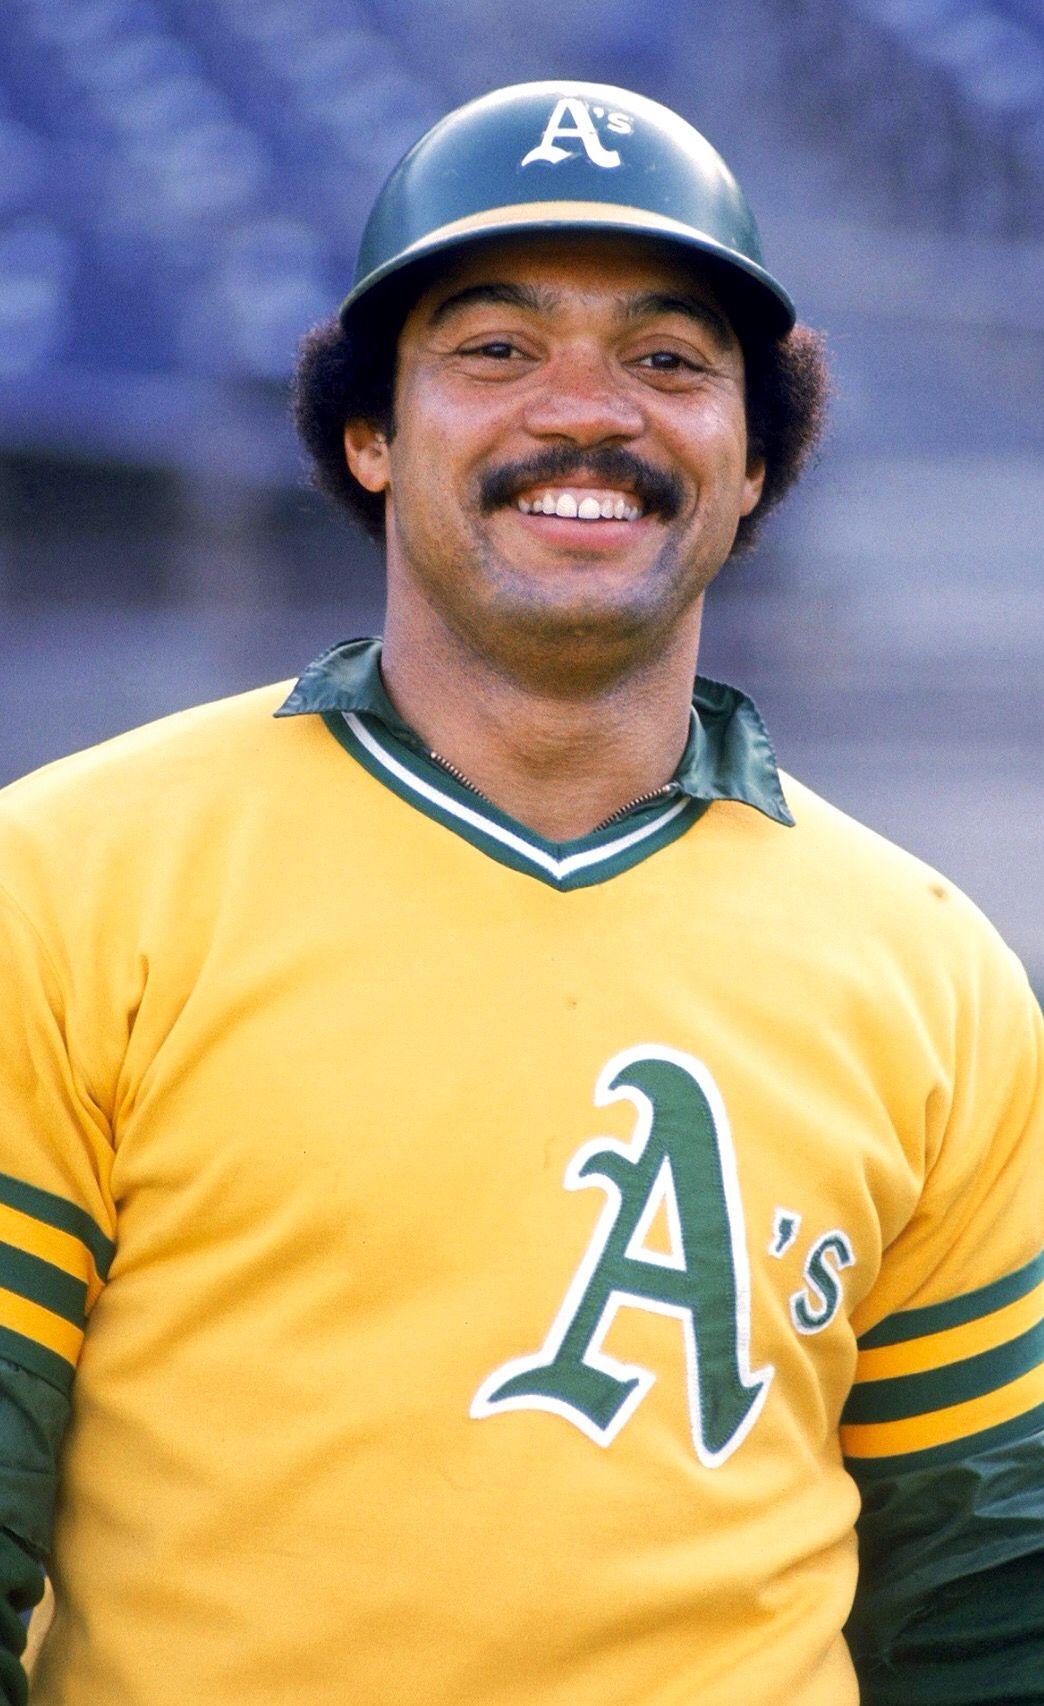 a5c6334cd0b0 Reggie Jackson | Oakland Athletics Dynasty | Baseball, Baseball ...